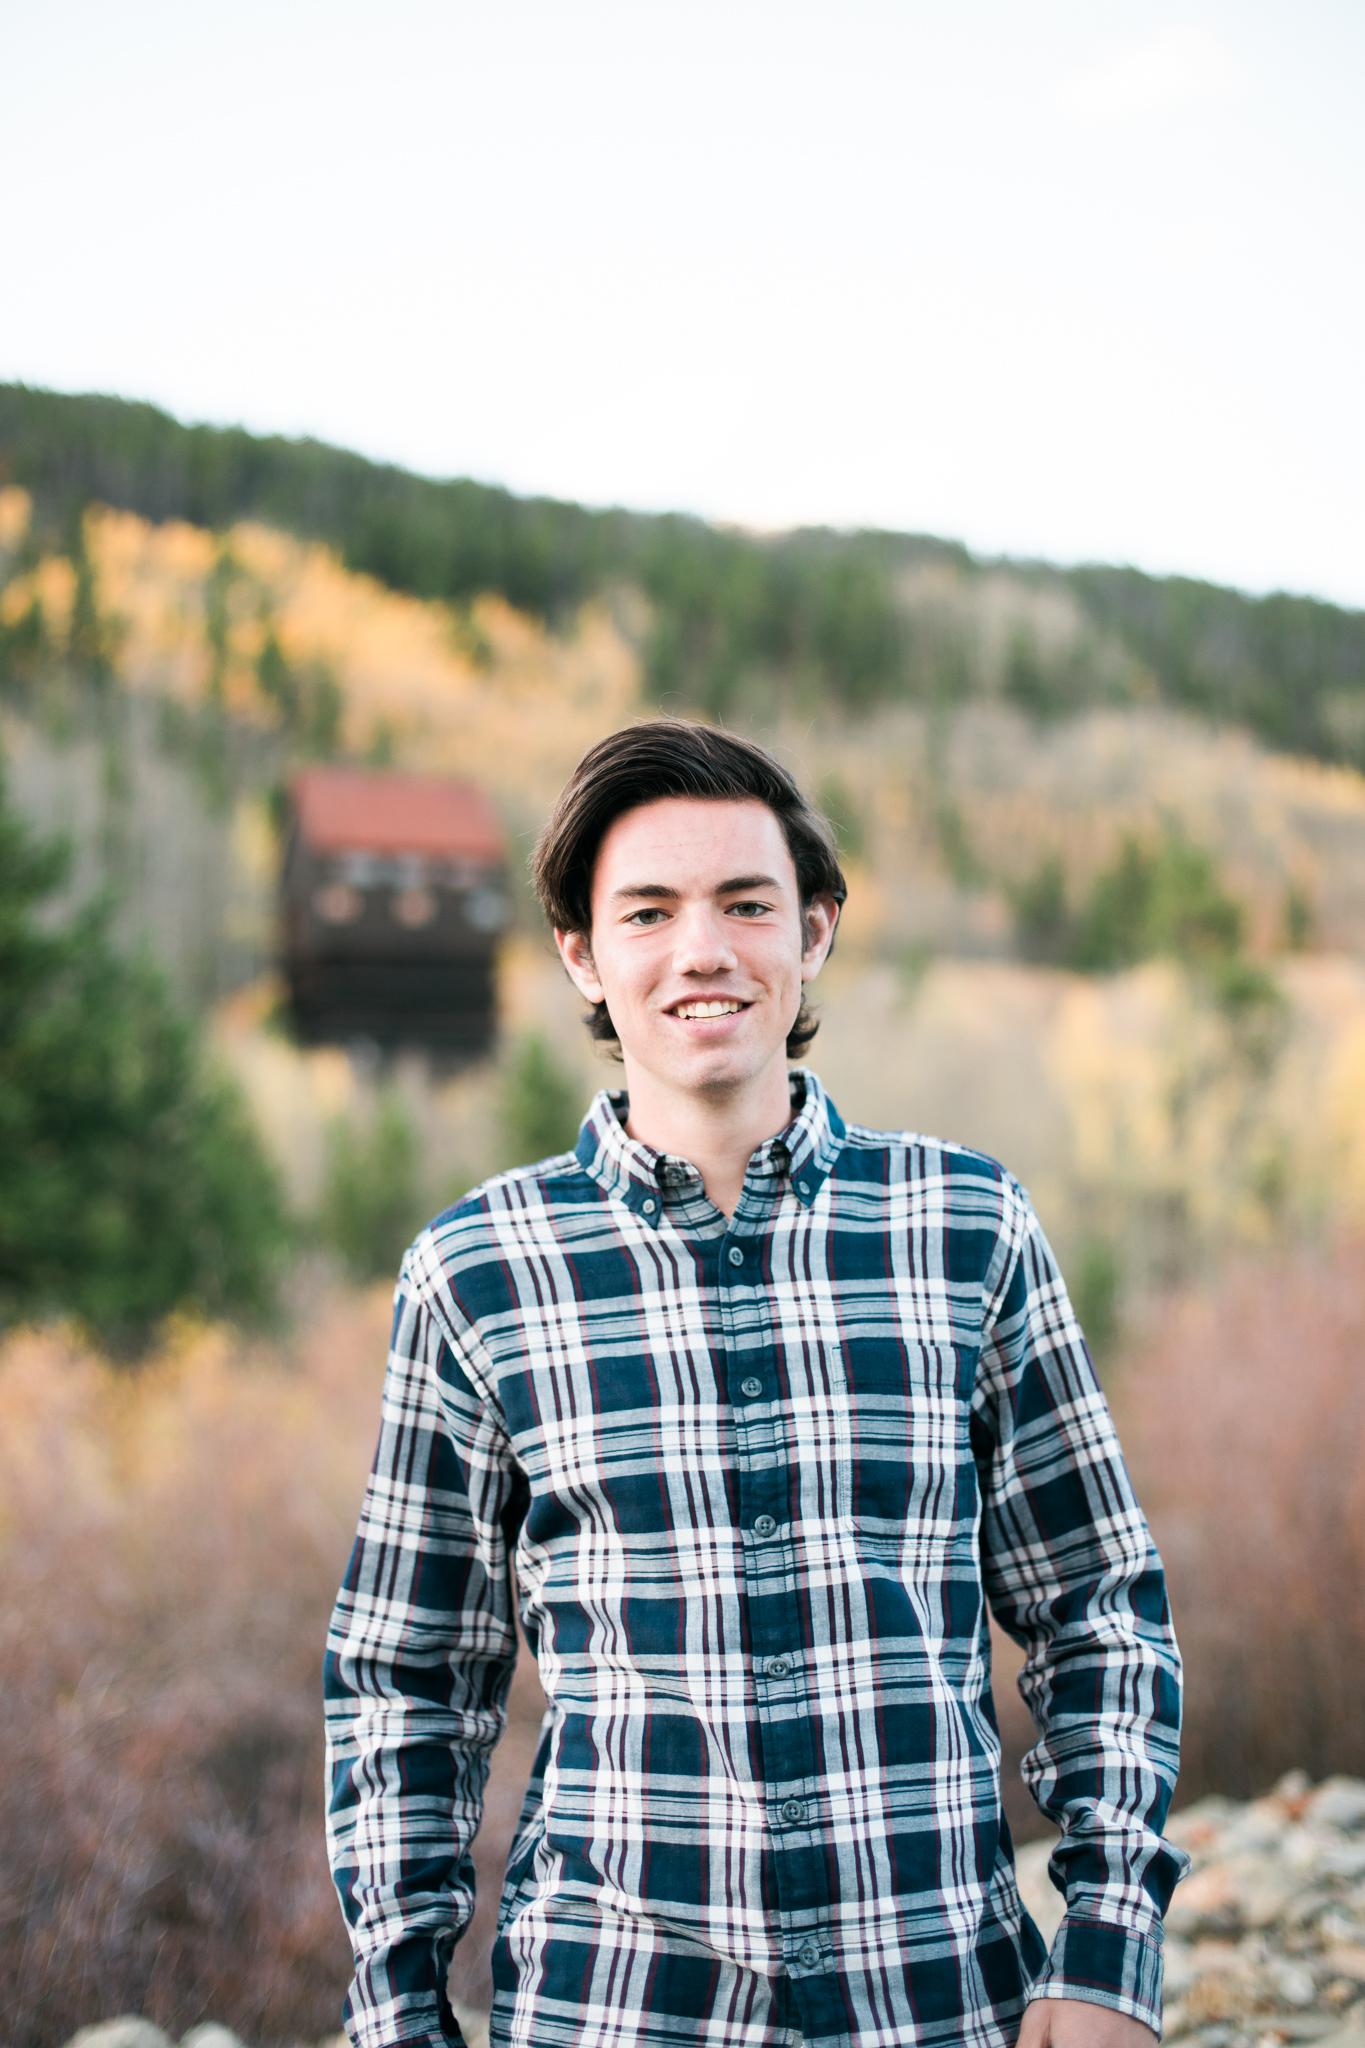 Peter Breckenridge Senior